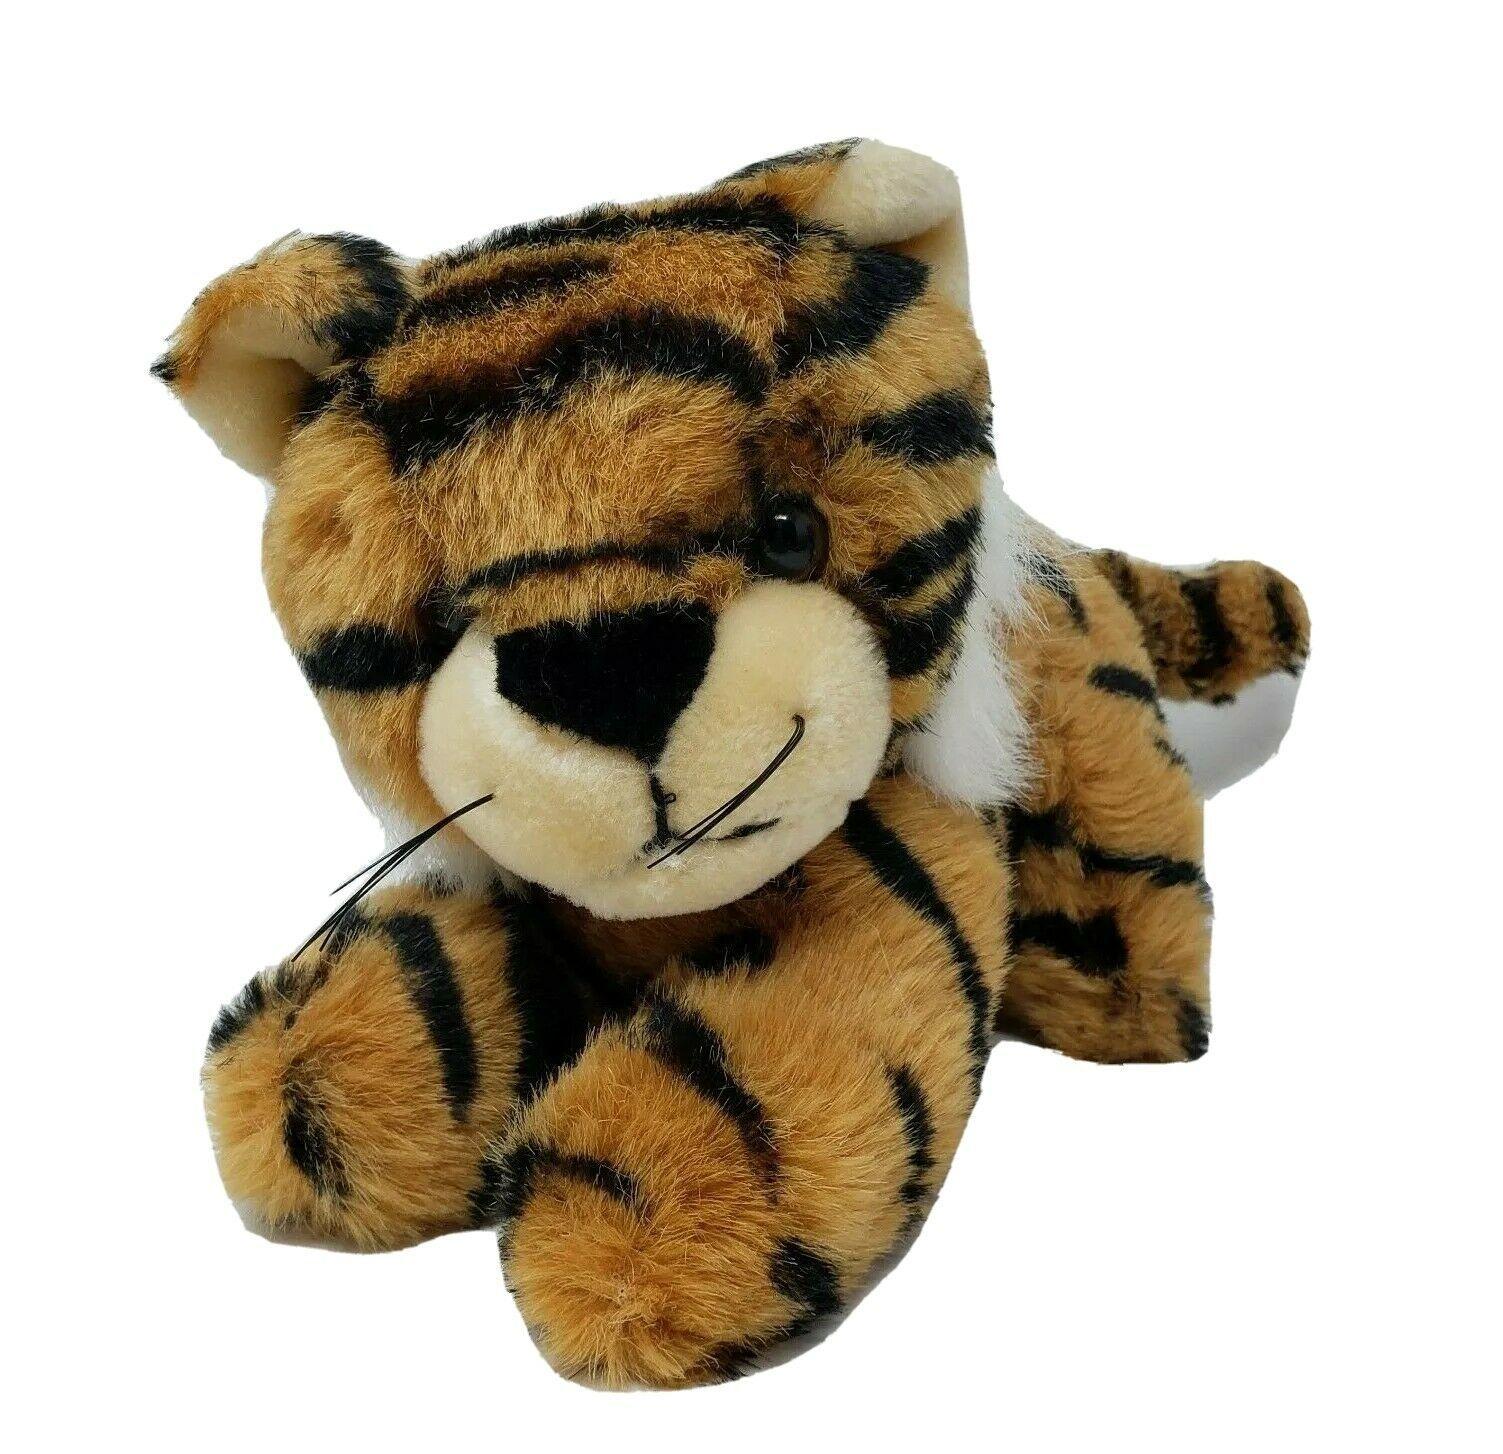 VINTAGE 1989 FIESTA BLACK & ORANGE STRIPED BABY TIGER STUFFED ANIMAL PLUSH TOY - $36.47